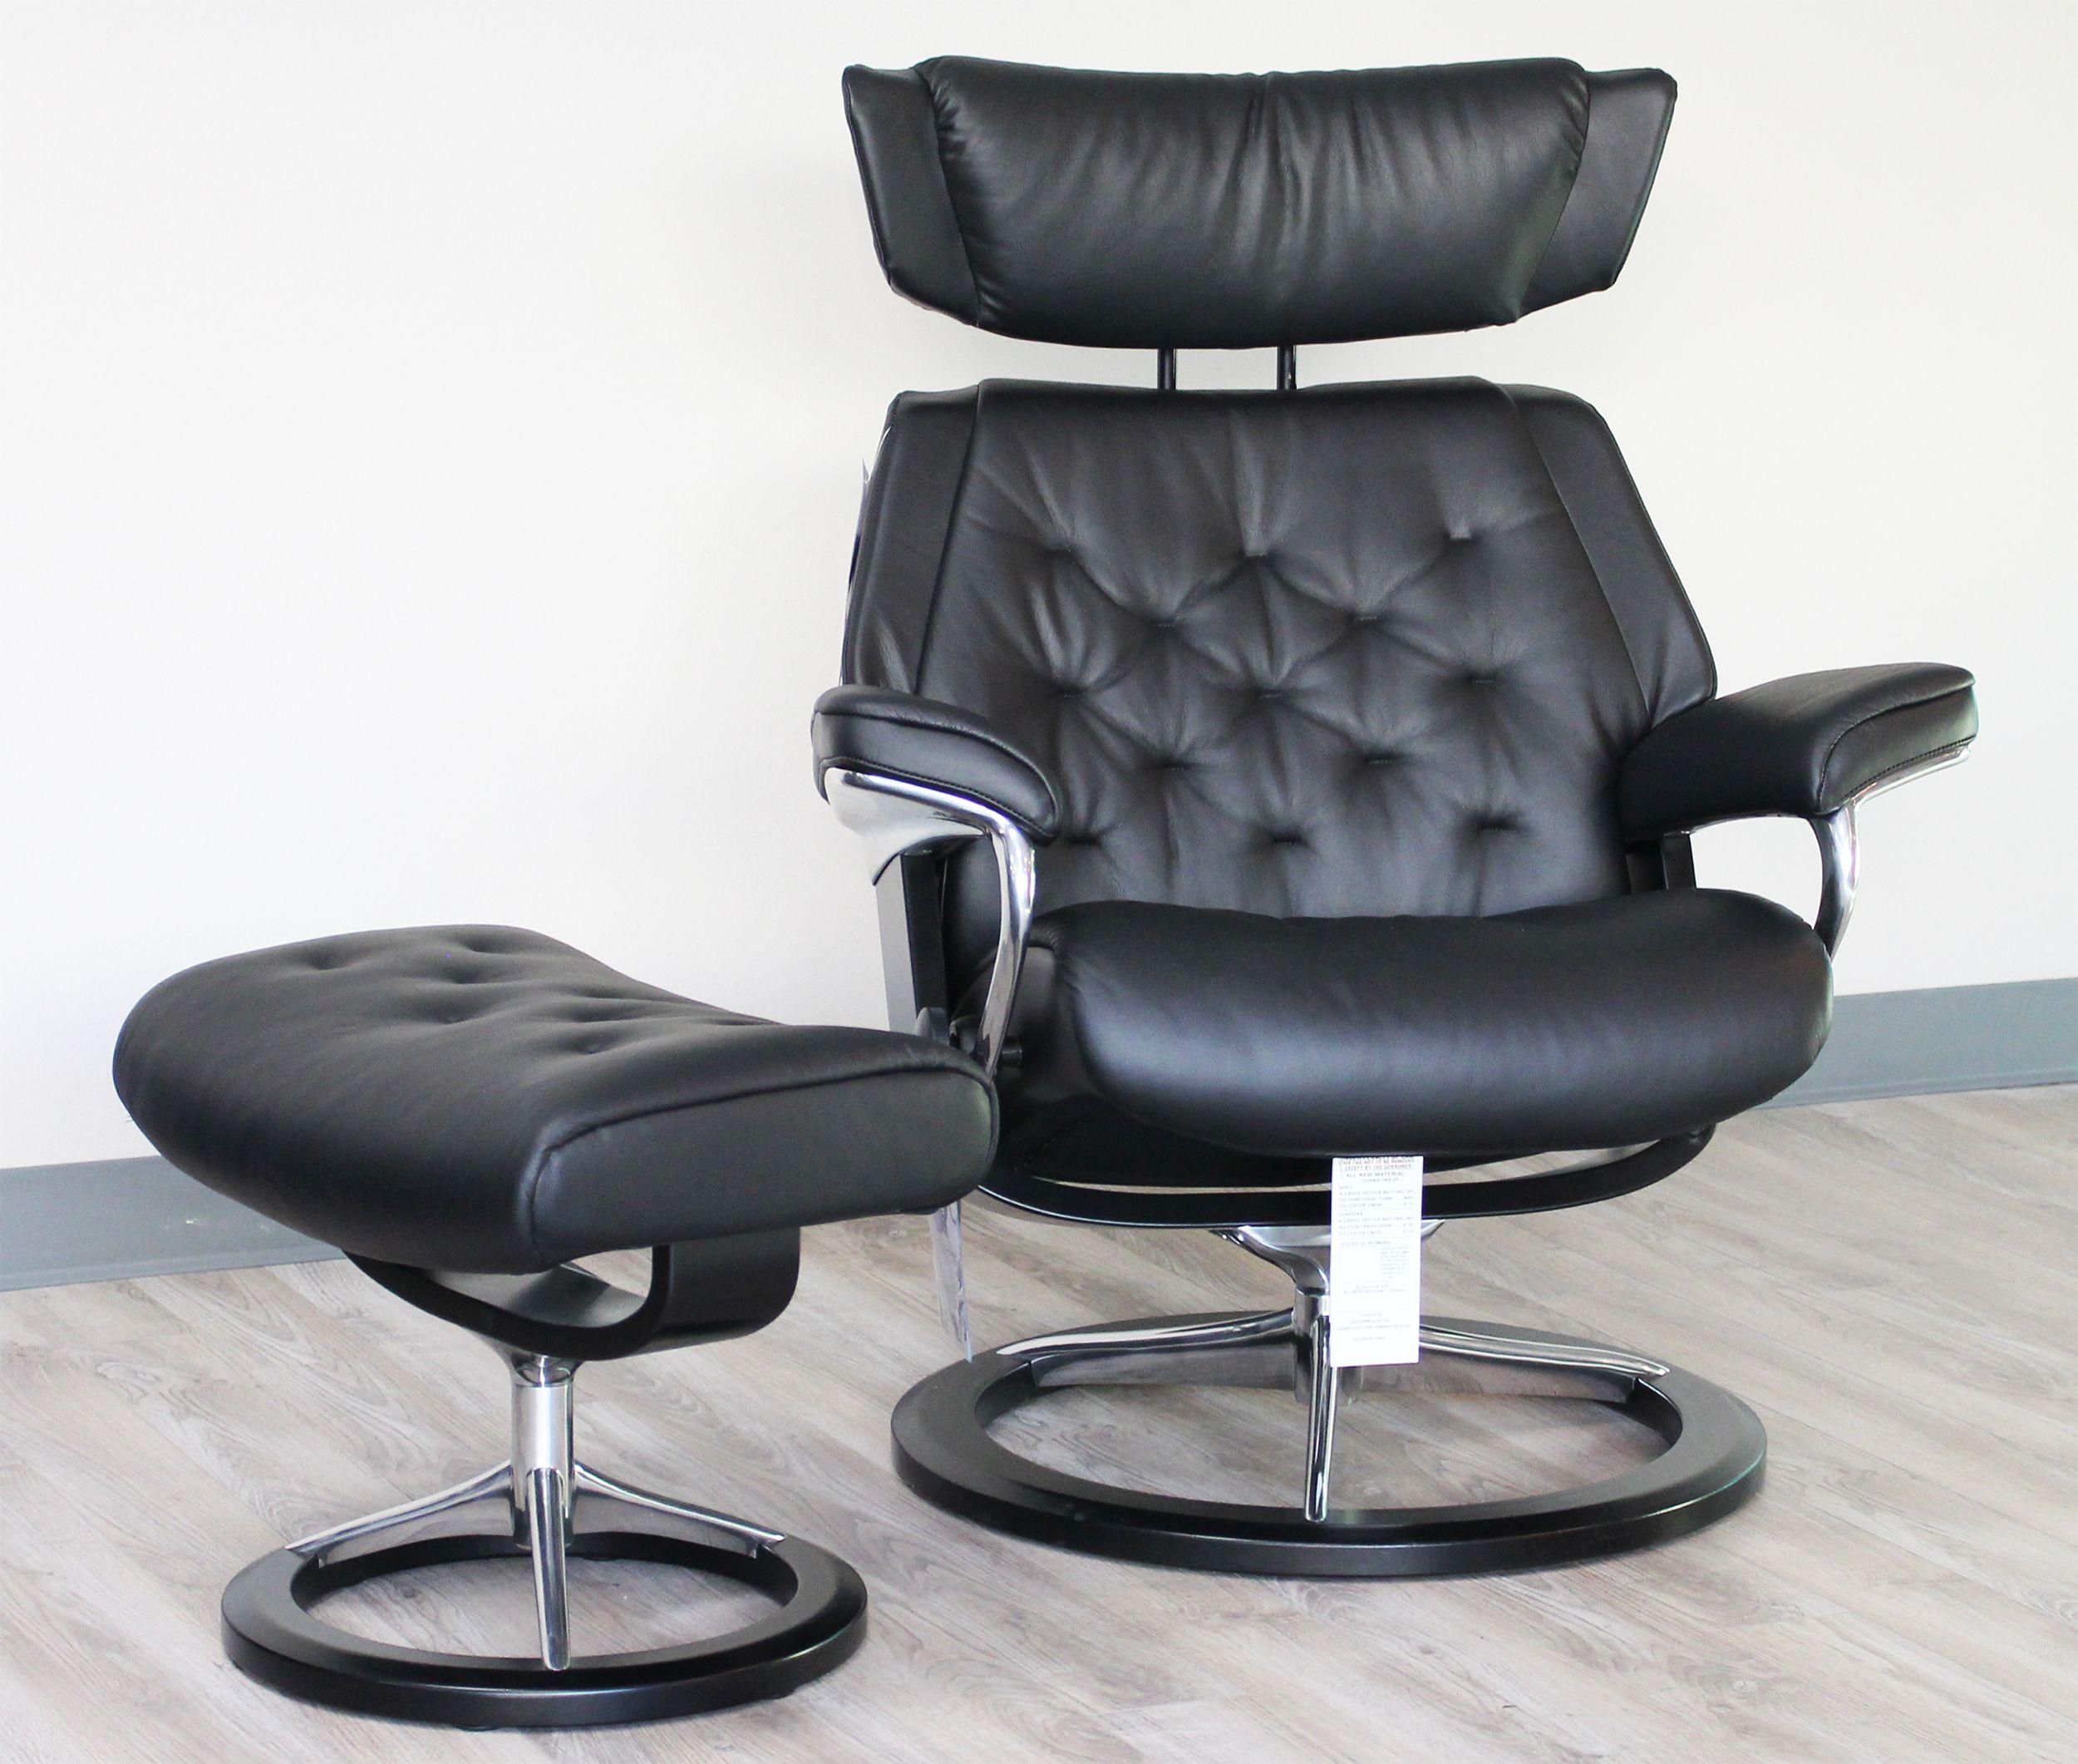 Stressless Chair Stressless Pacific Large Ergonomic Khaki Paloma